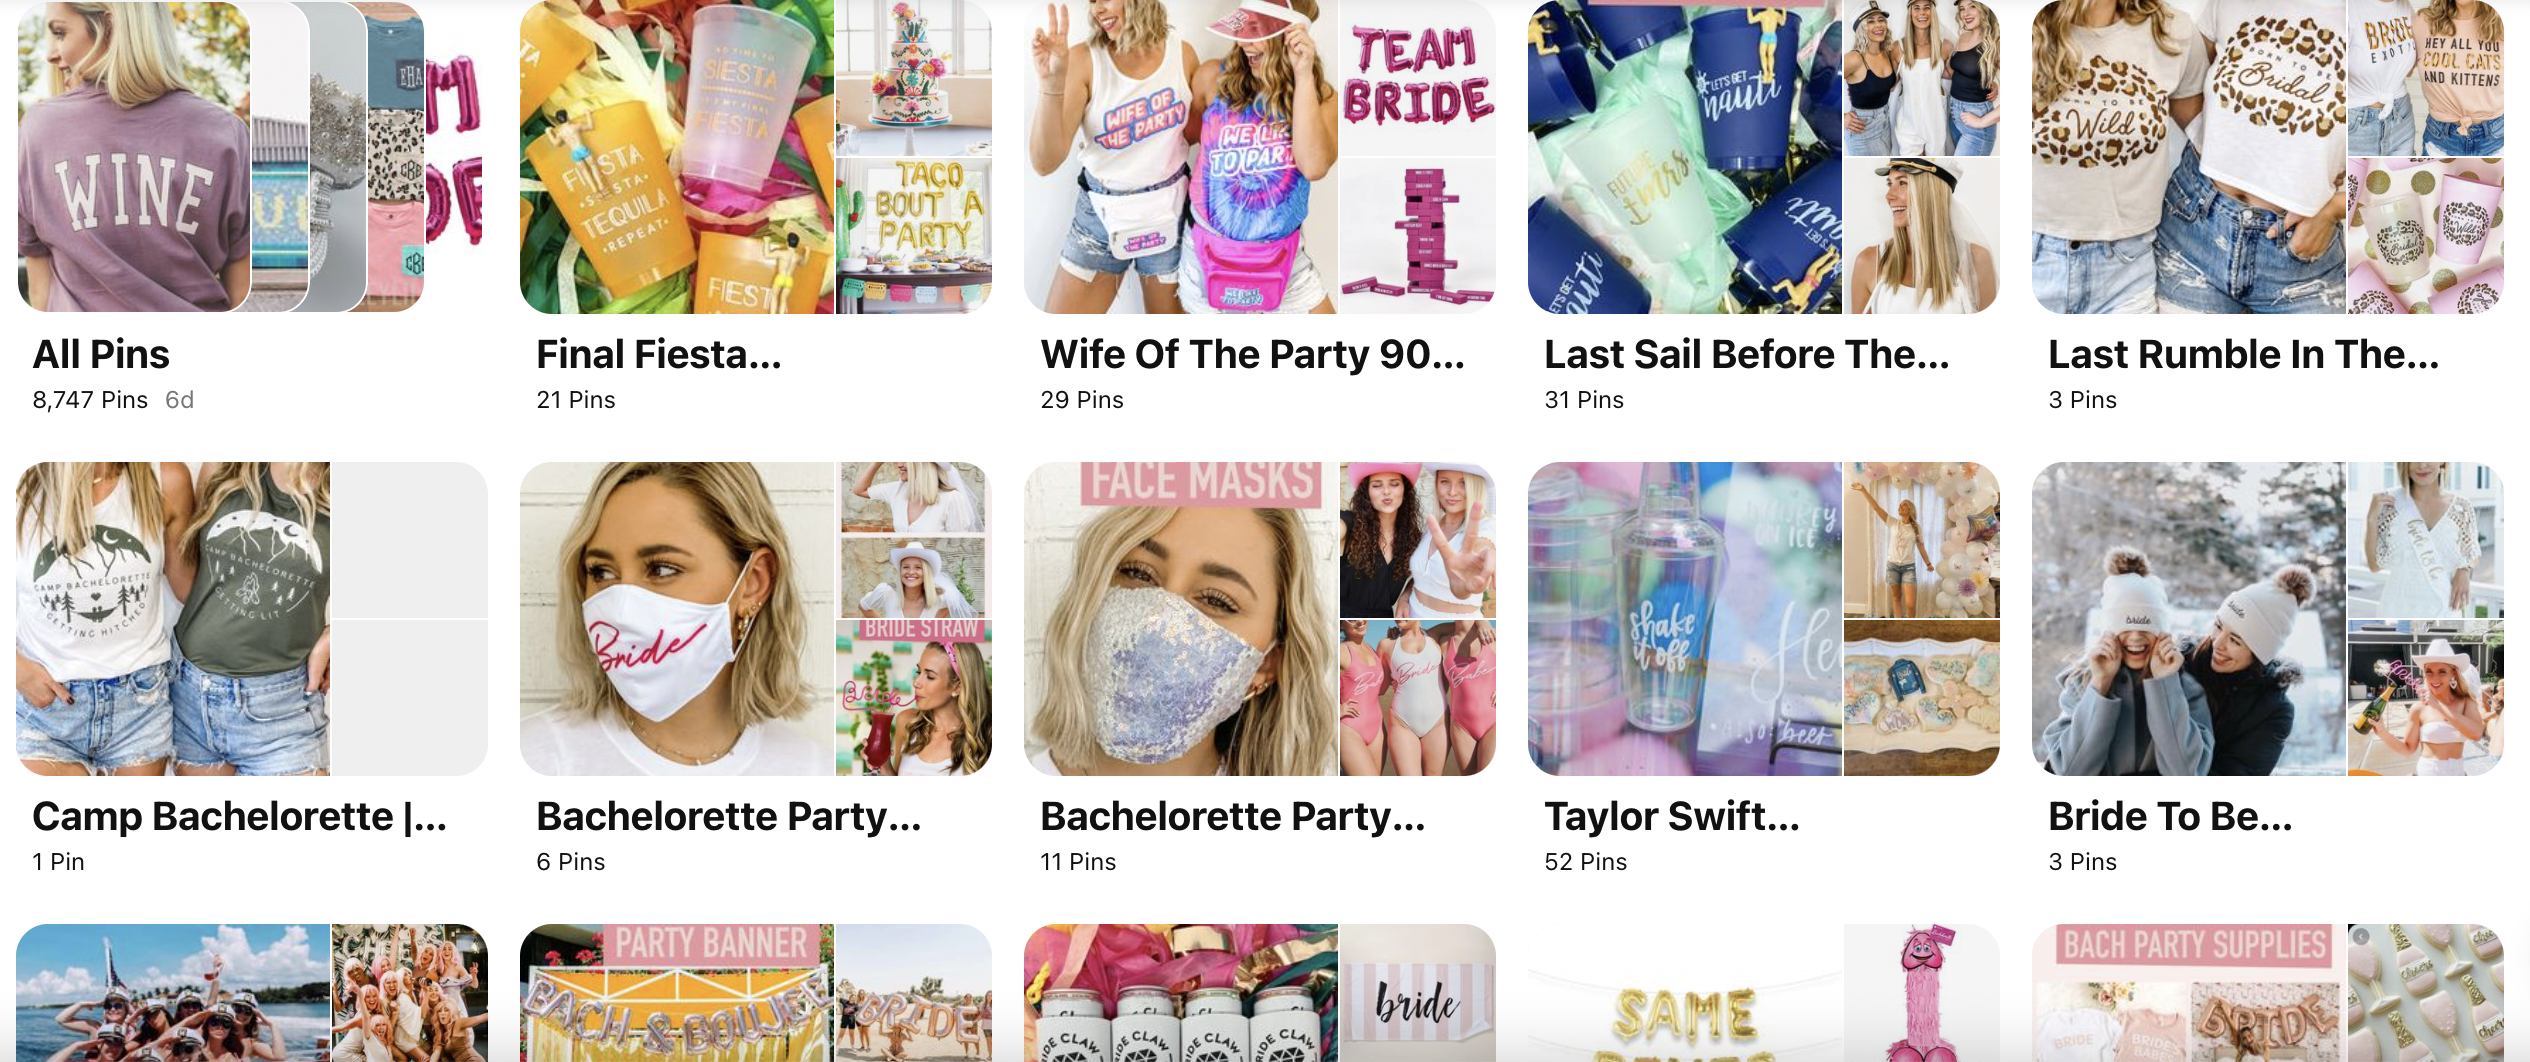 Bachelorette Party Decorations on Pinterest: Stag & Hen